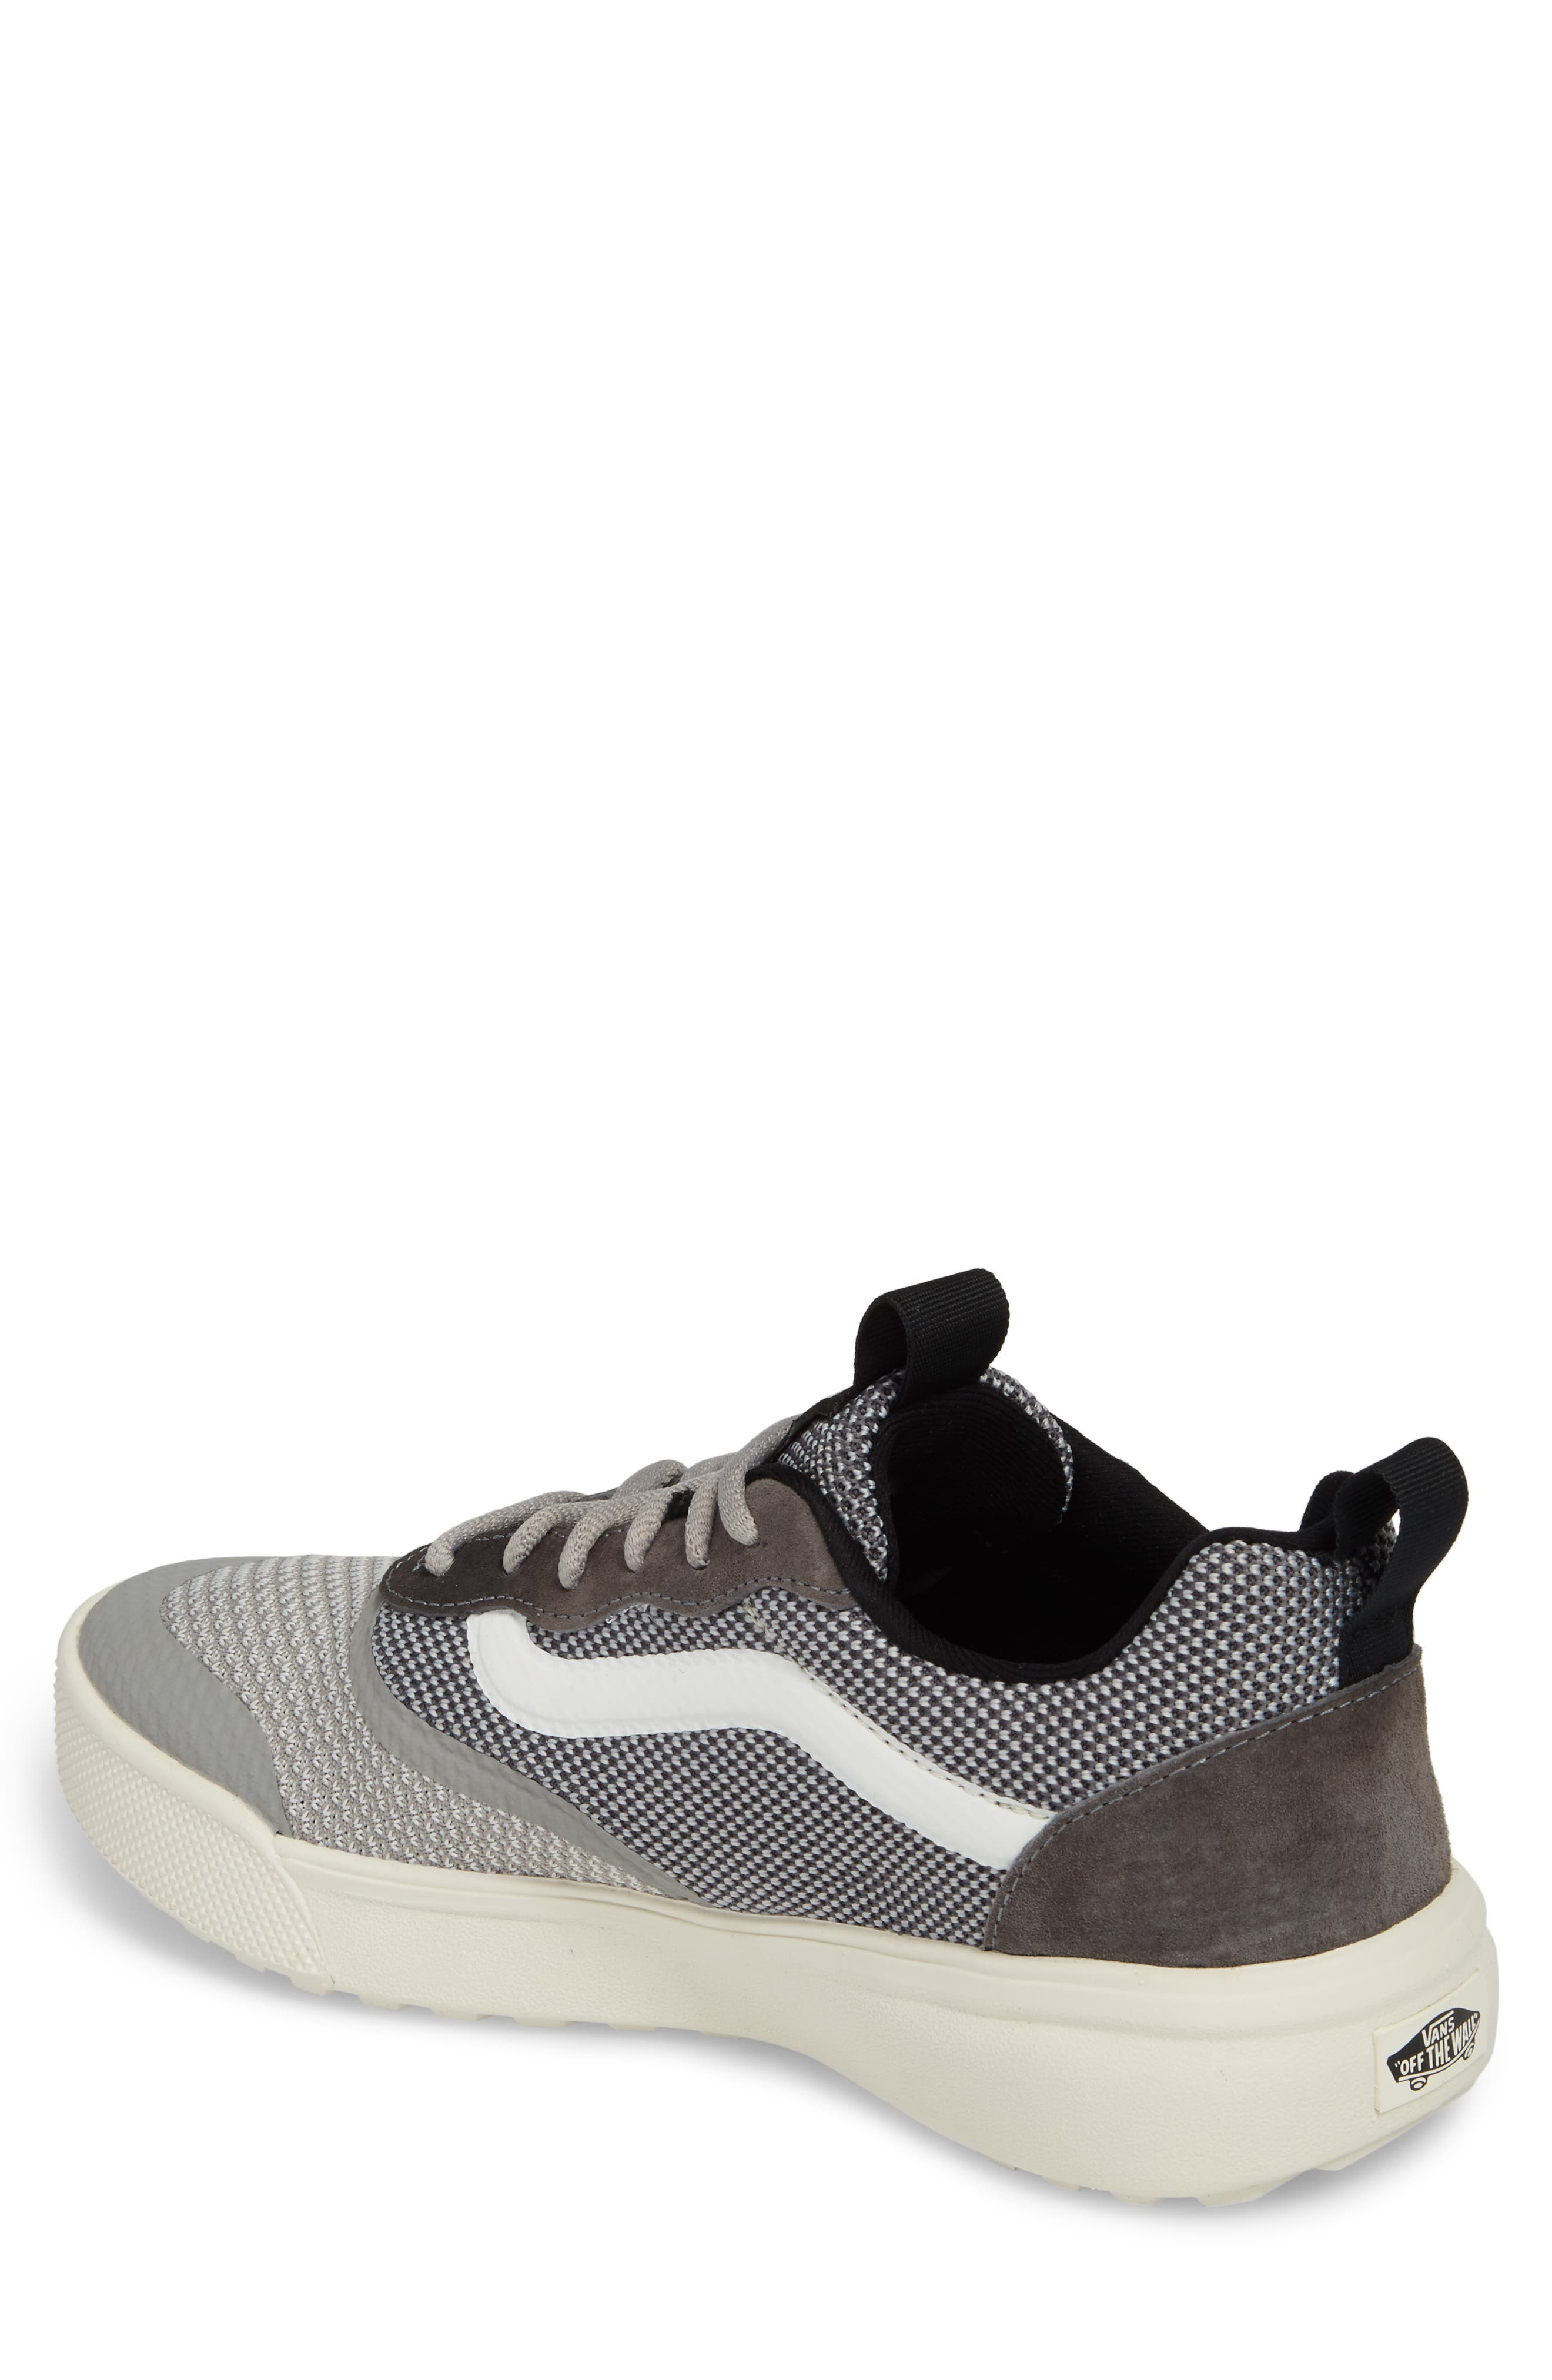 UltraRange DX Low Top Sneaker,                             Alternate thumbnail 2, color,                             021